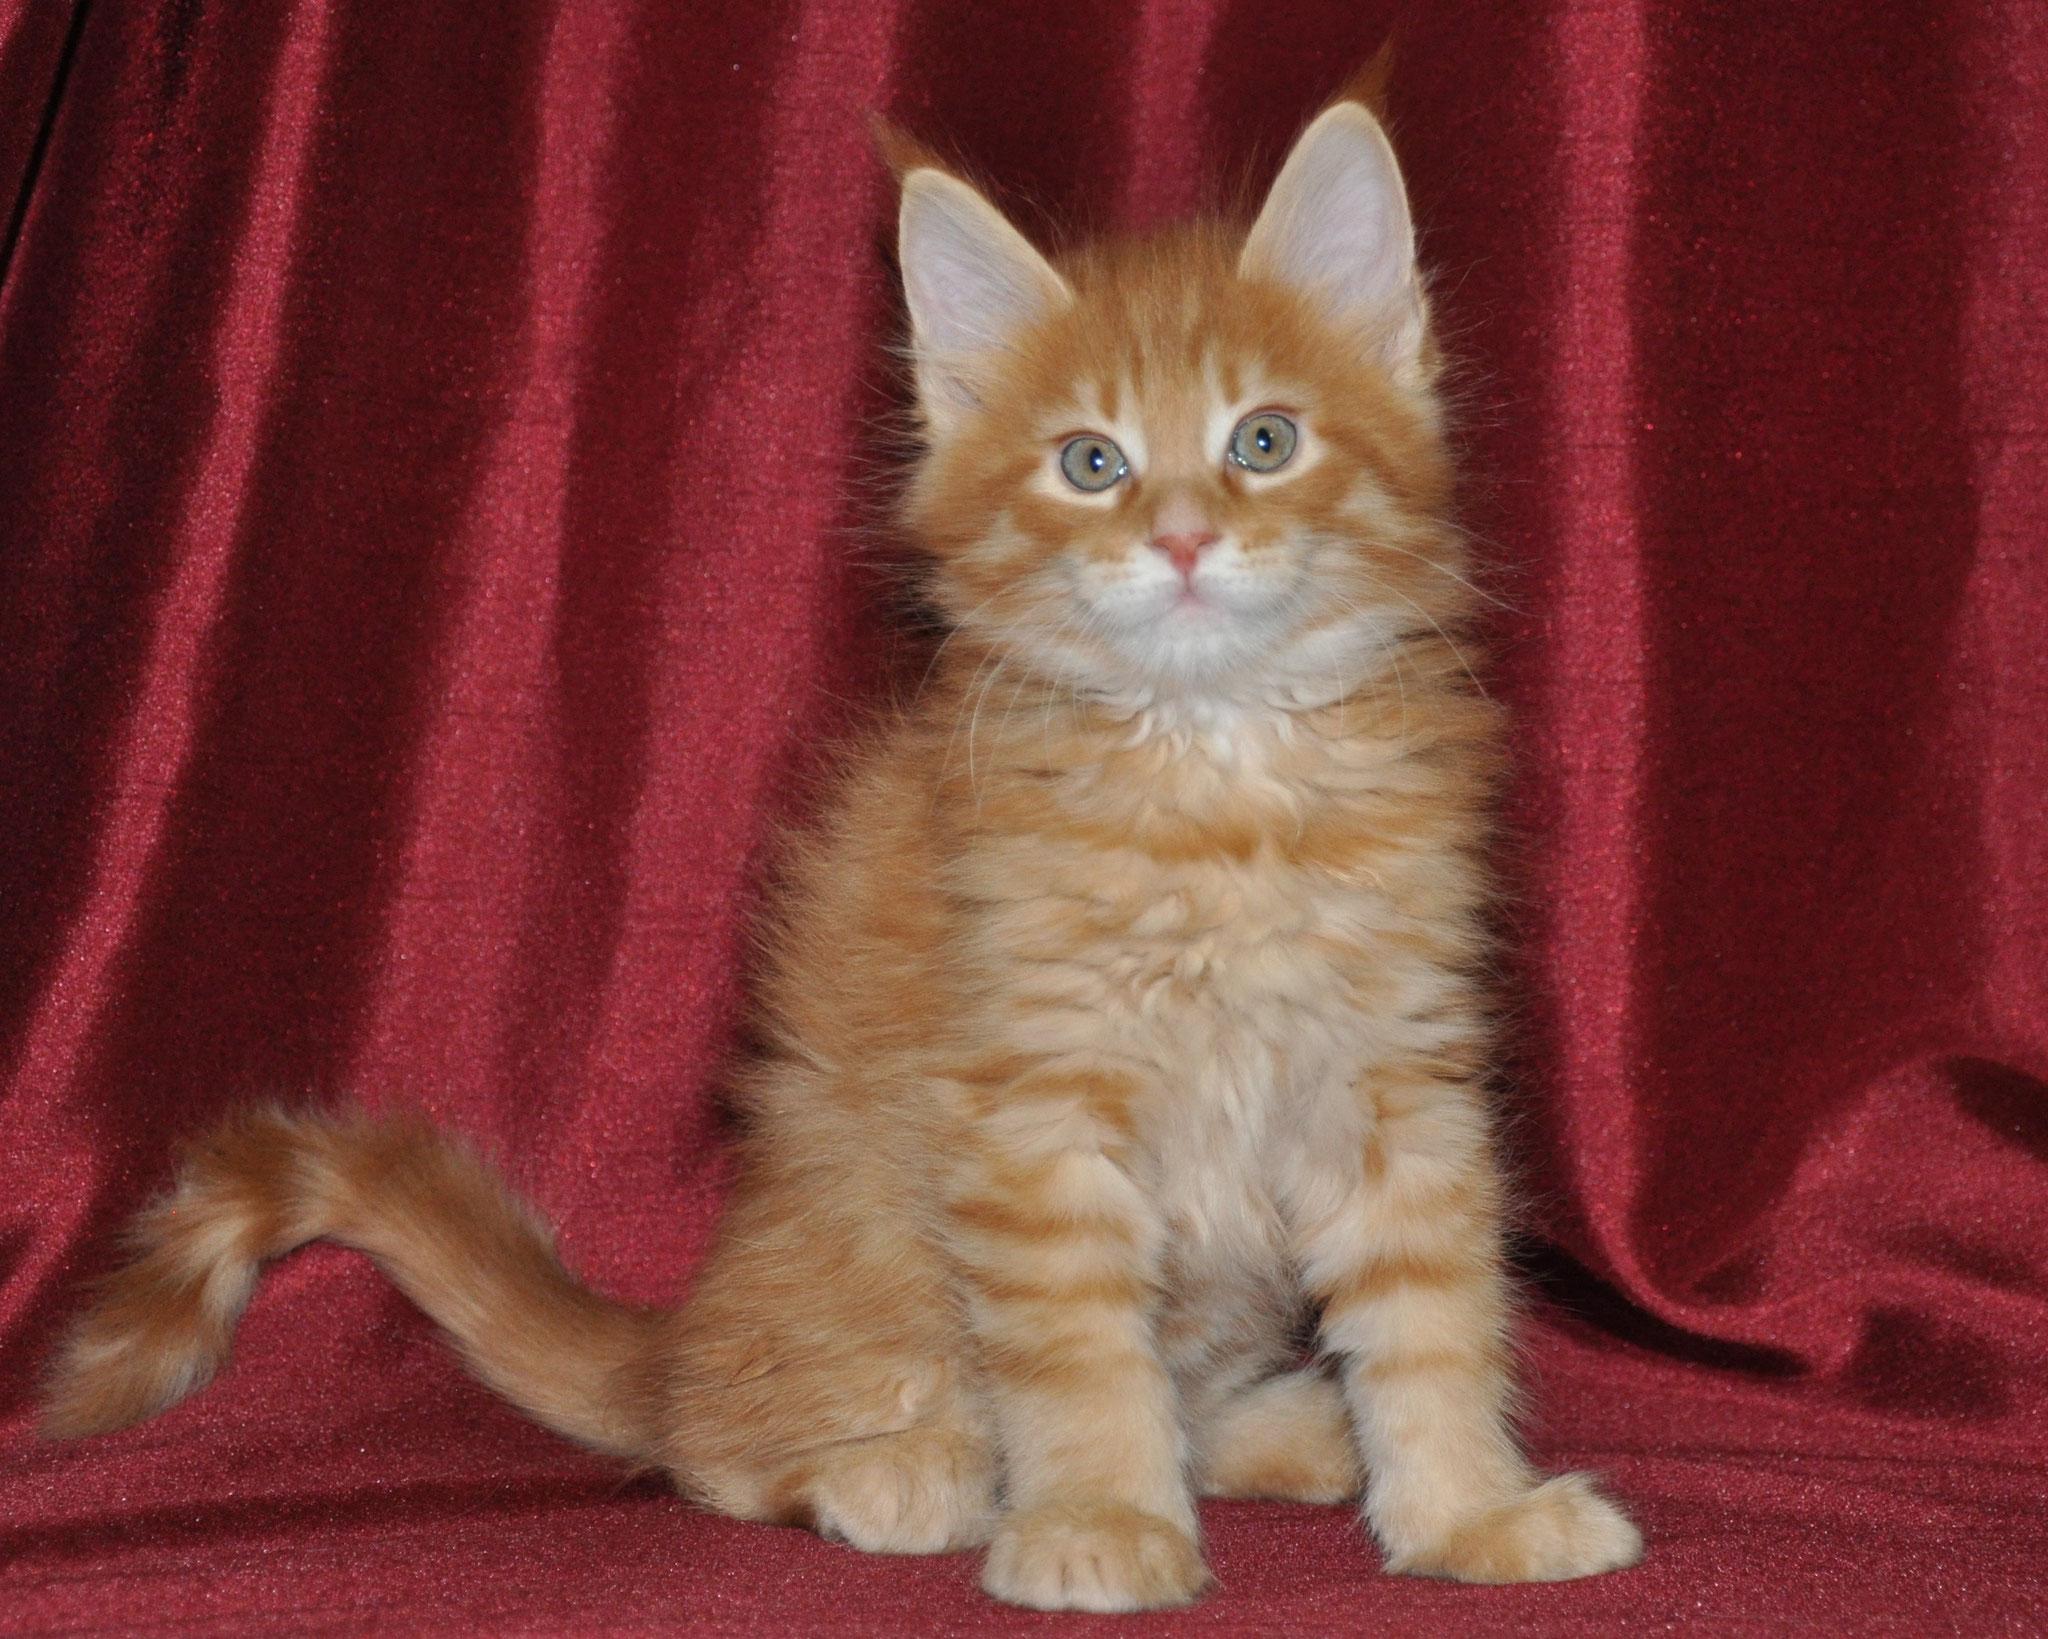 Dominic, 7 weeks